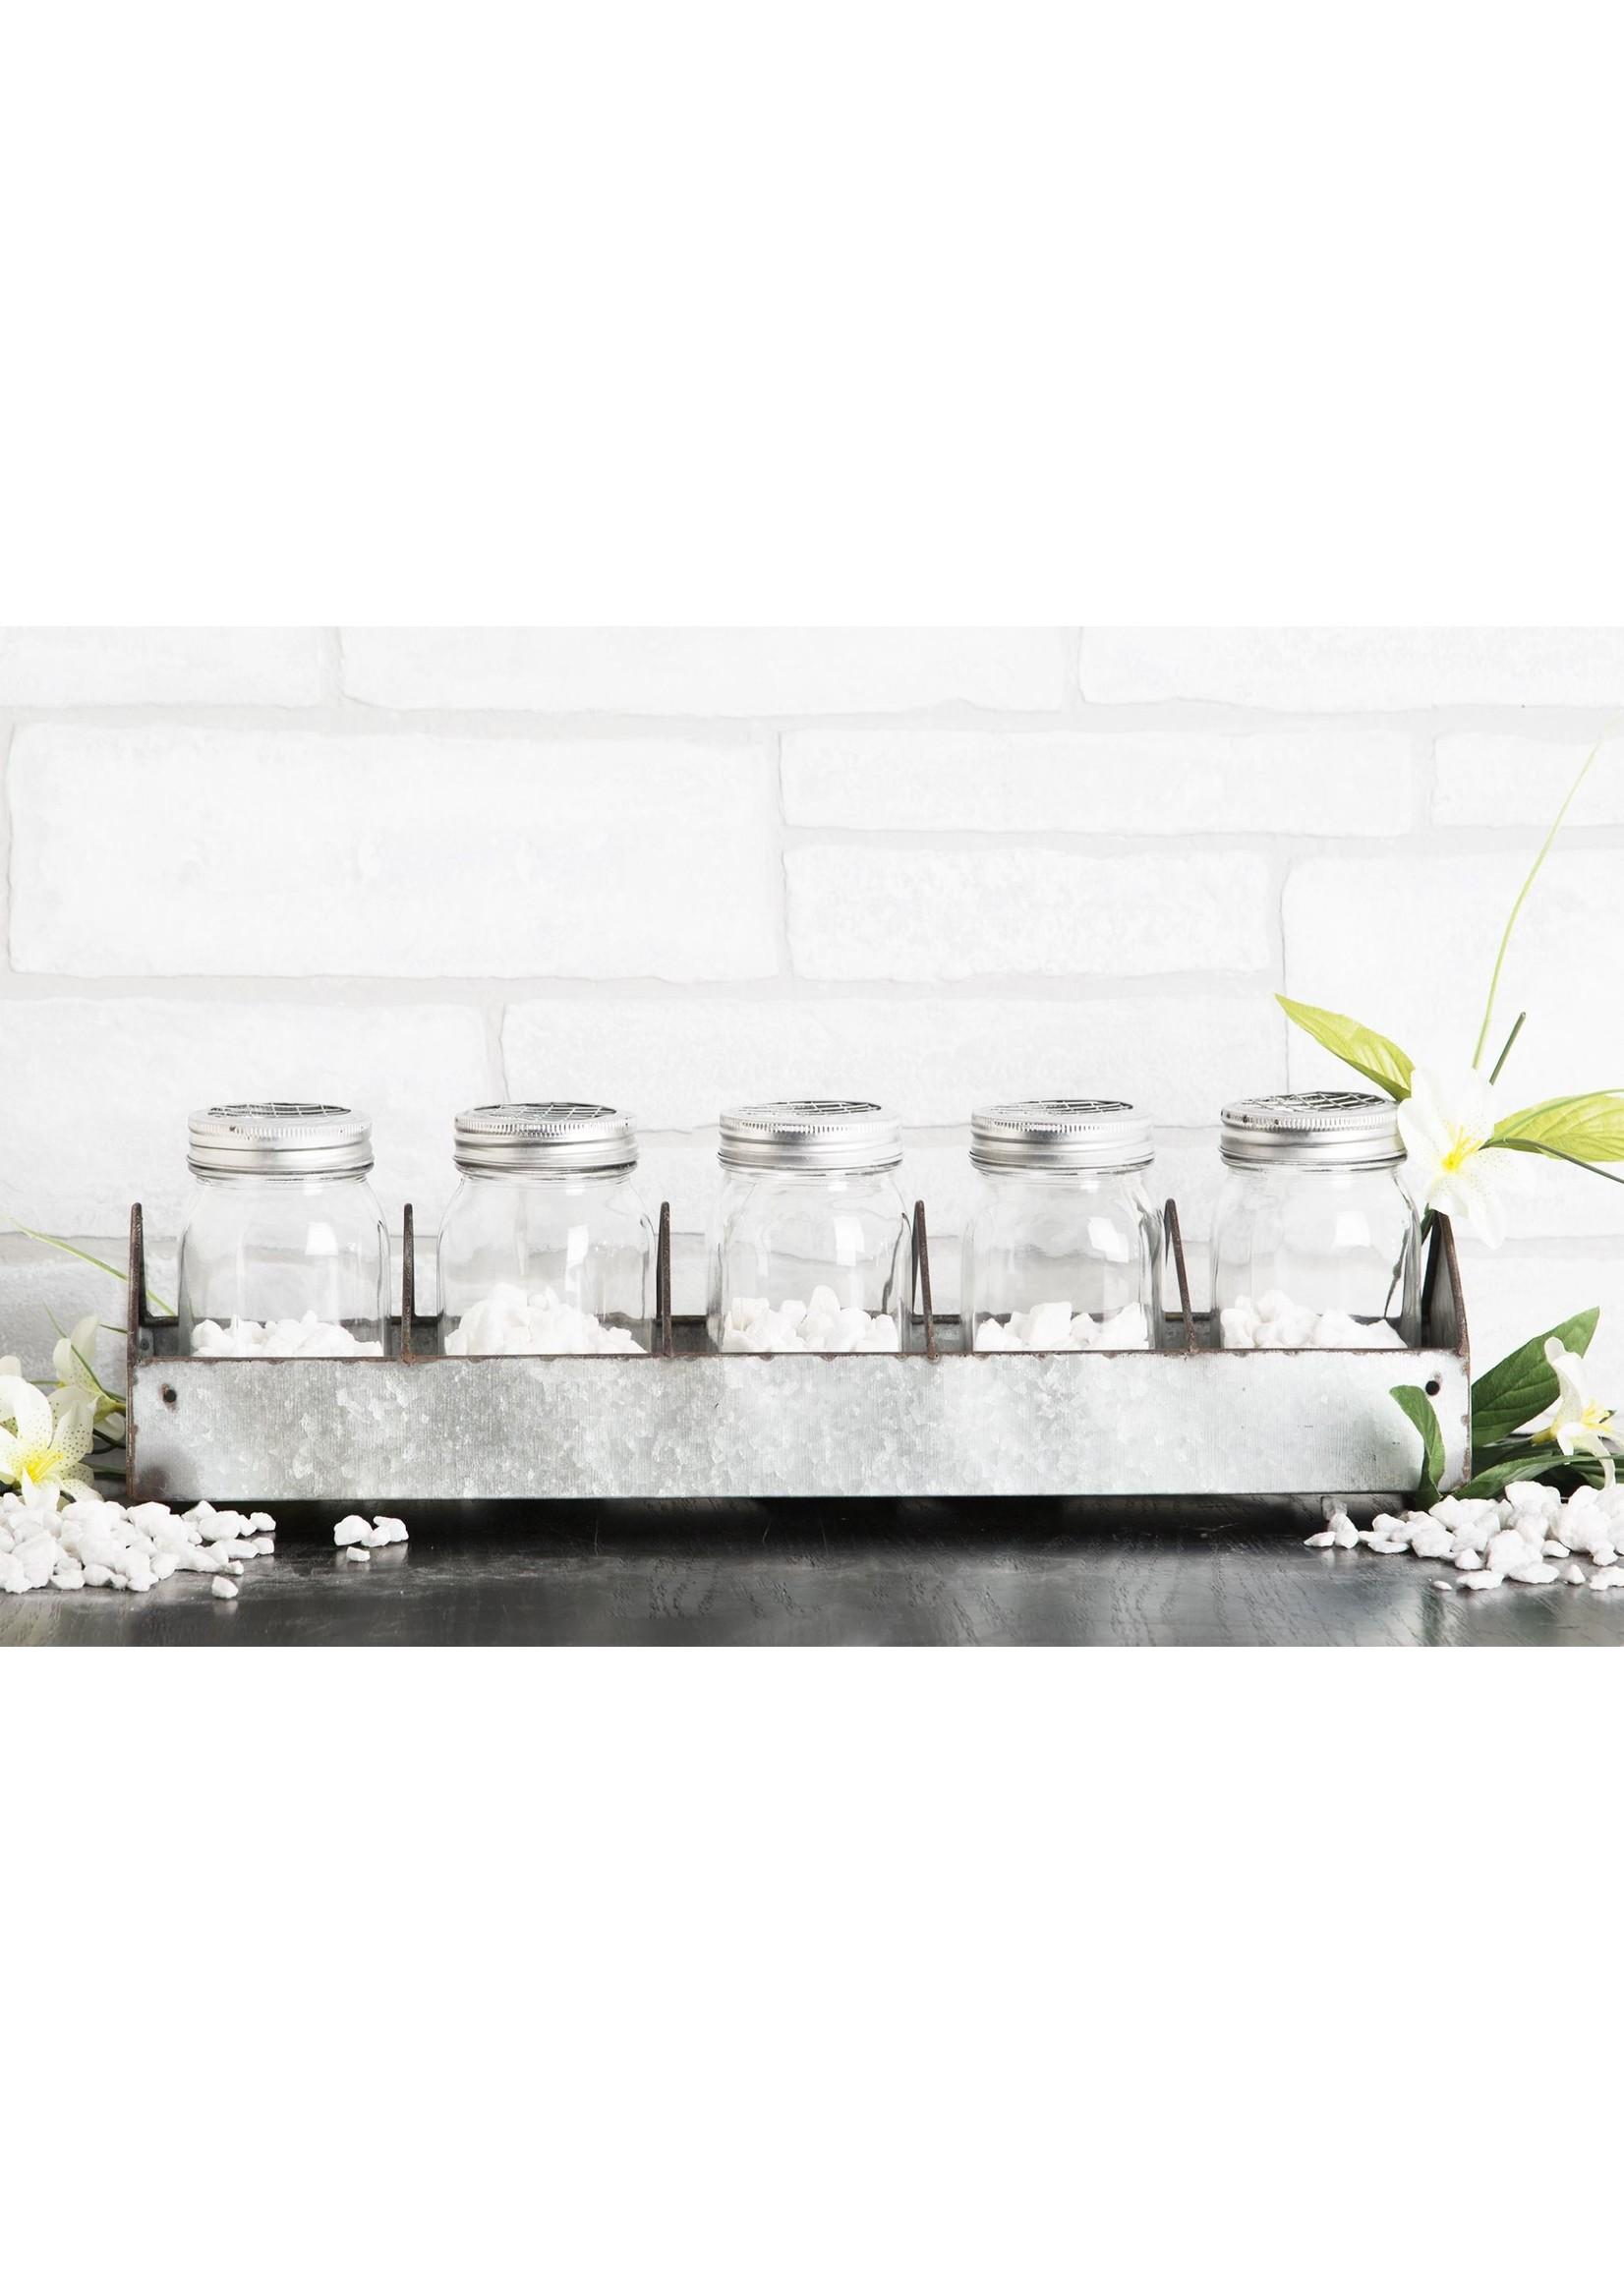 Home Essentials Mason Jar(5)  On Galvanized Tray